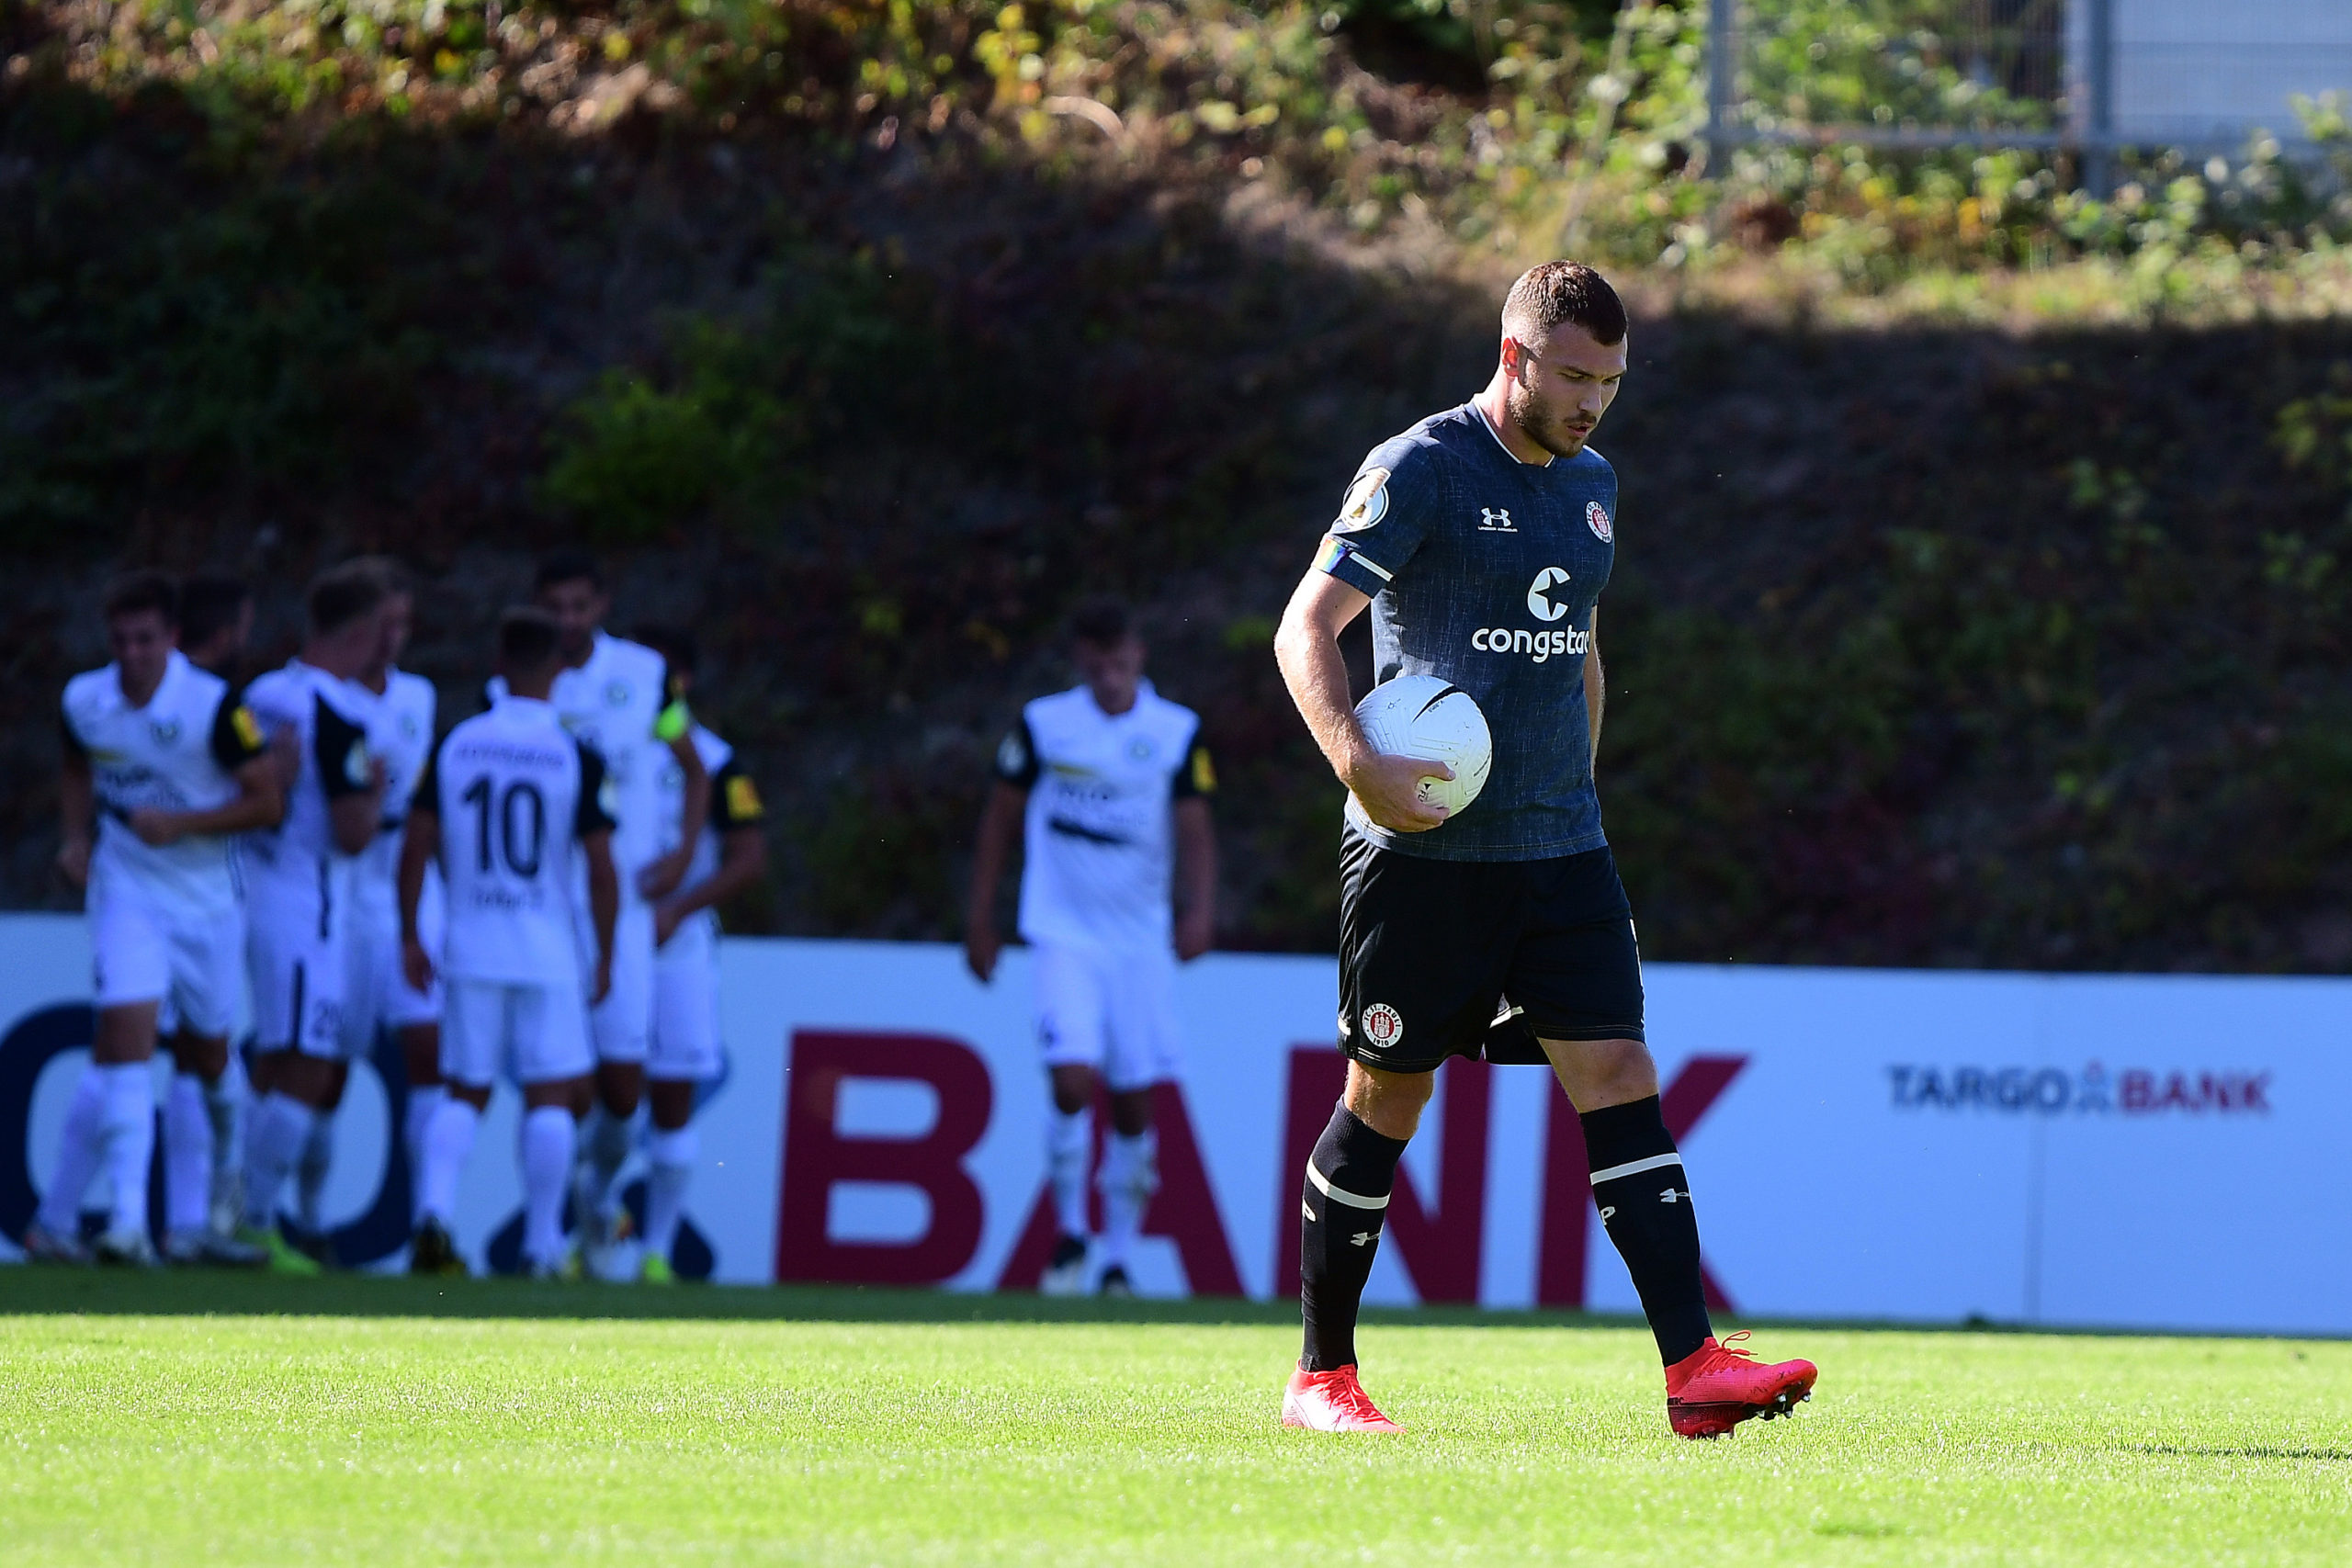 Nach dem Spiel – SV Elversberg (A) – DFB Pokal Runde 1 – Saison 2020/21